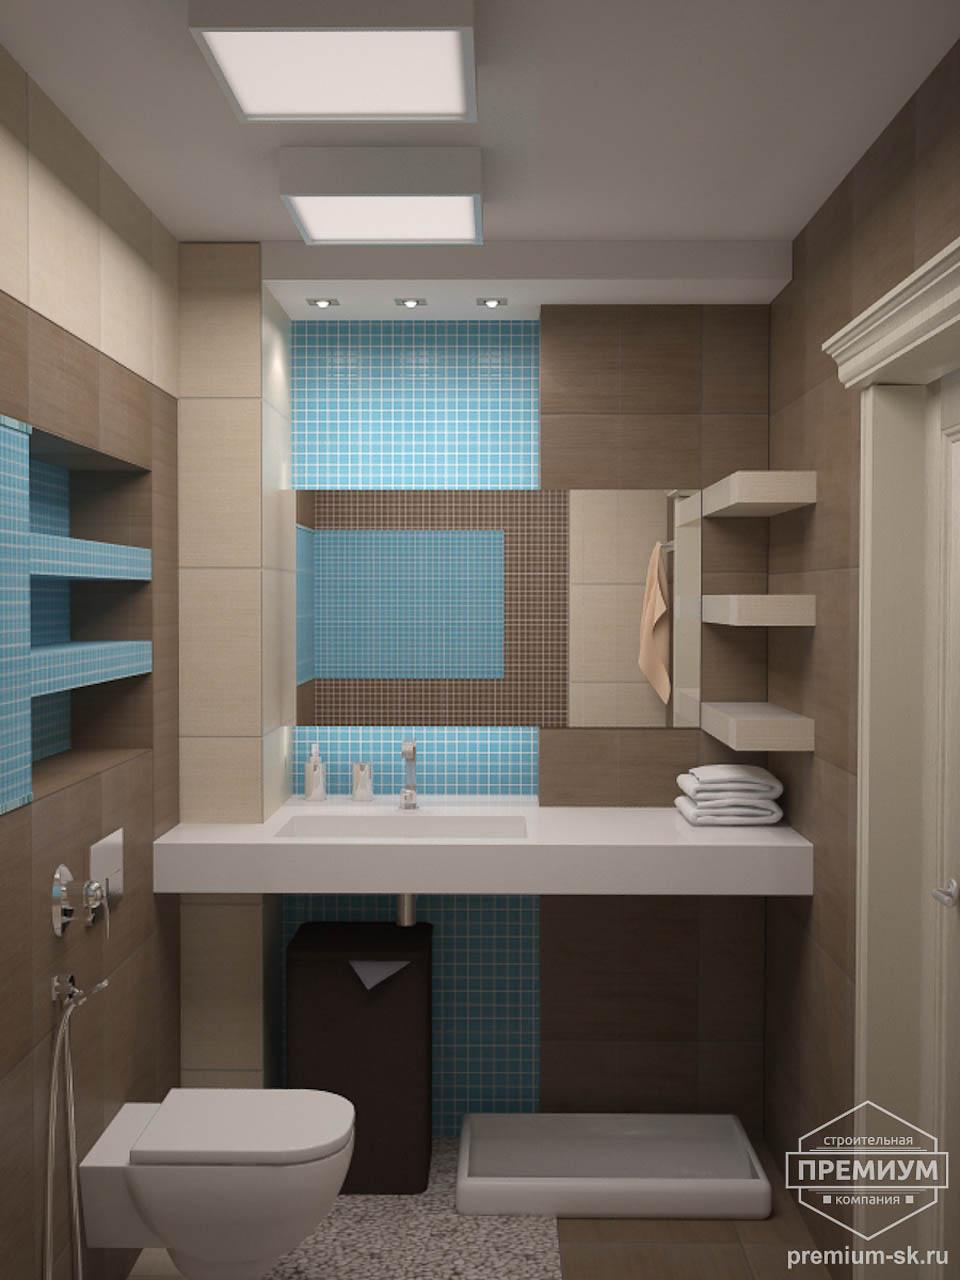 Дизайн интерьера однокомнатной квартиры по ул. Сыромолотова 11 img1178815481